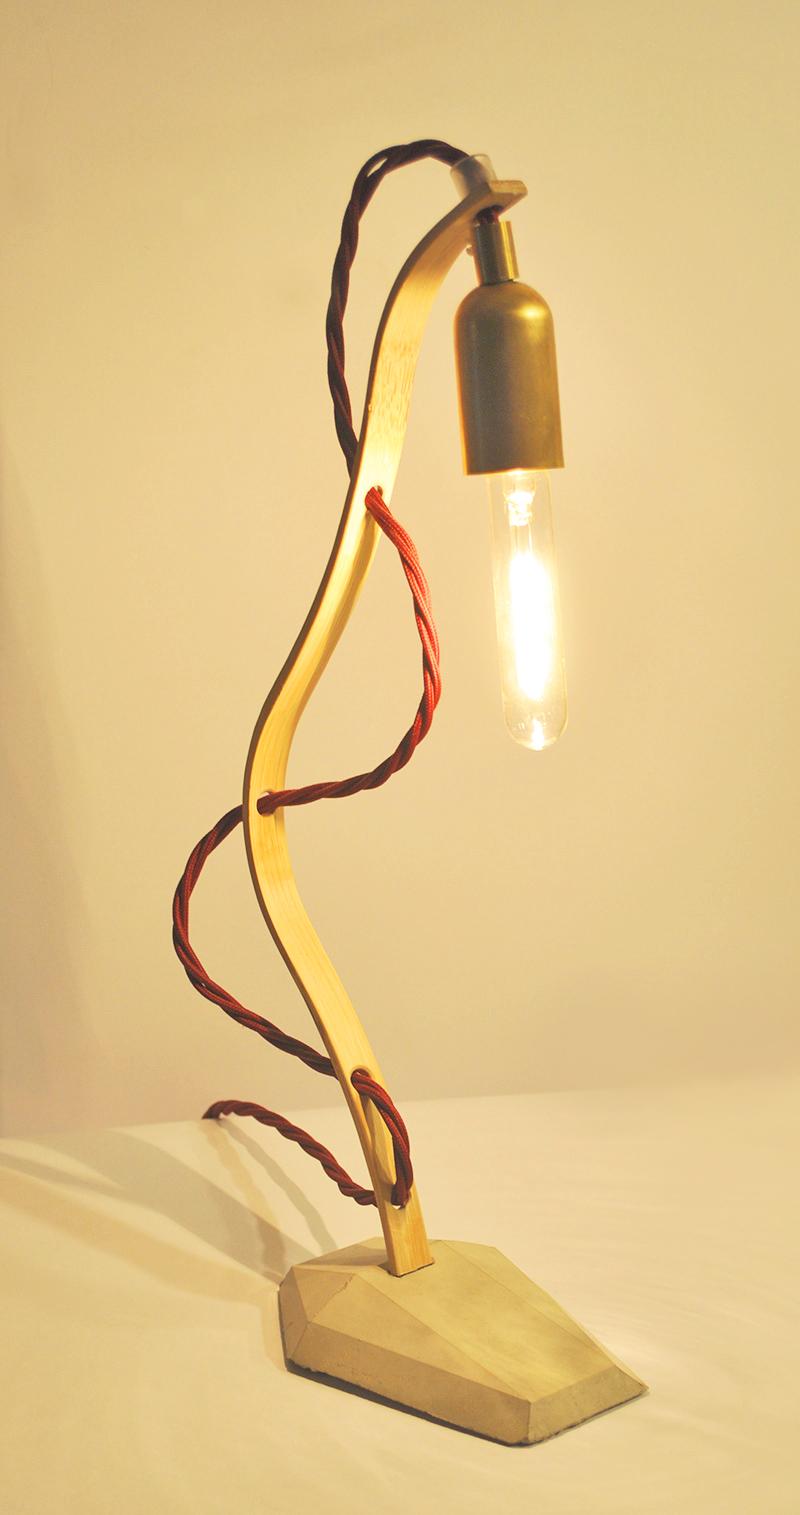 HANGING LOOSE Tischlampe_ BAMBOO_MESSING_ 34m x 10cm x 8cm_  dison Vintage Glühbirne 25W_  Bordeauxrotes Textilkabel geflochten_